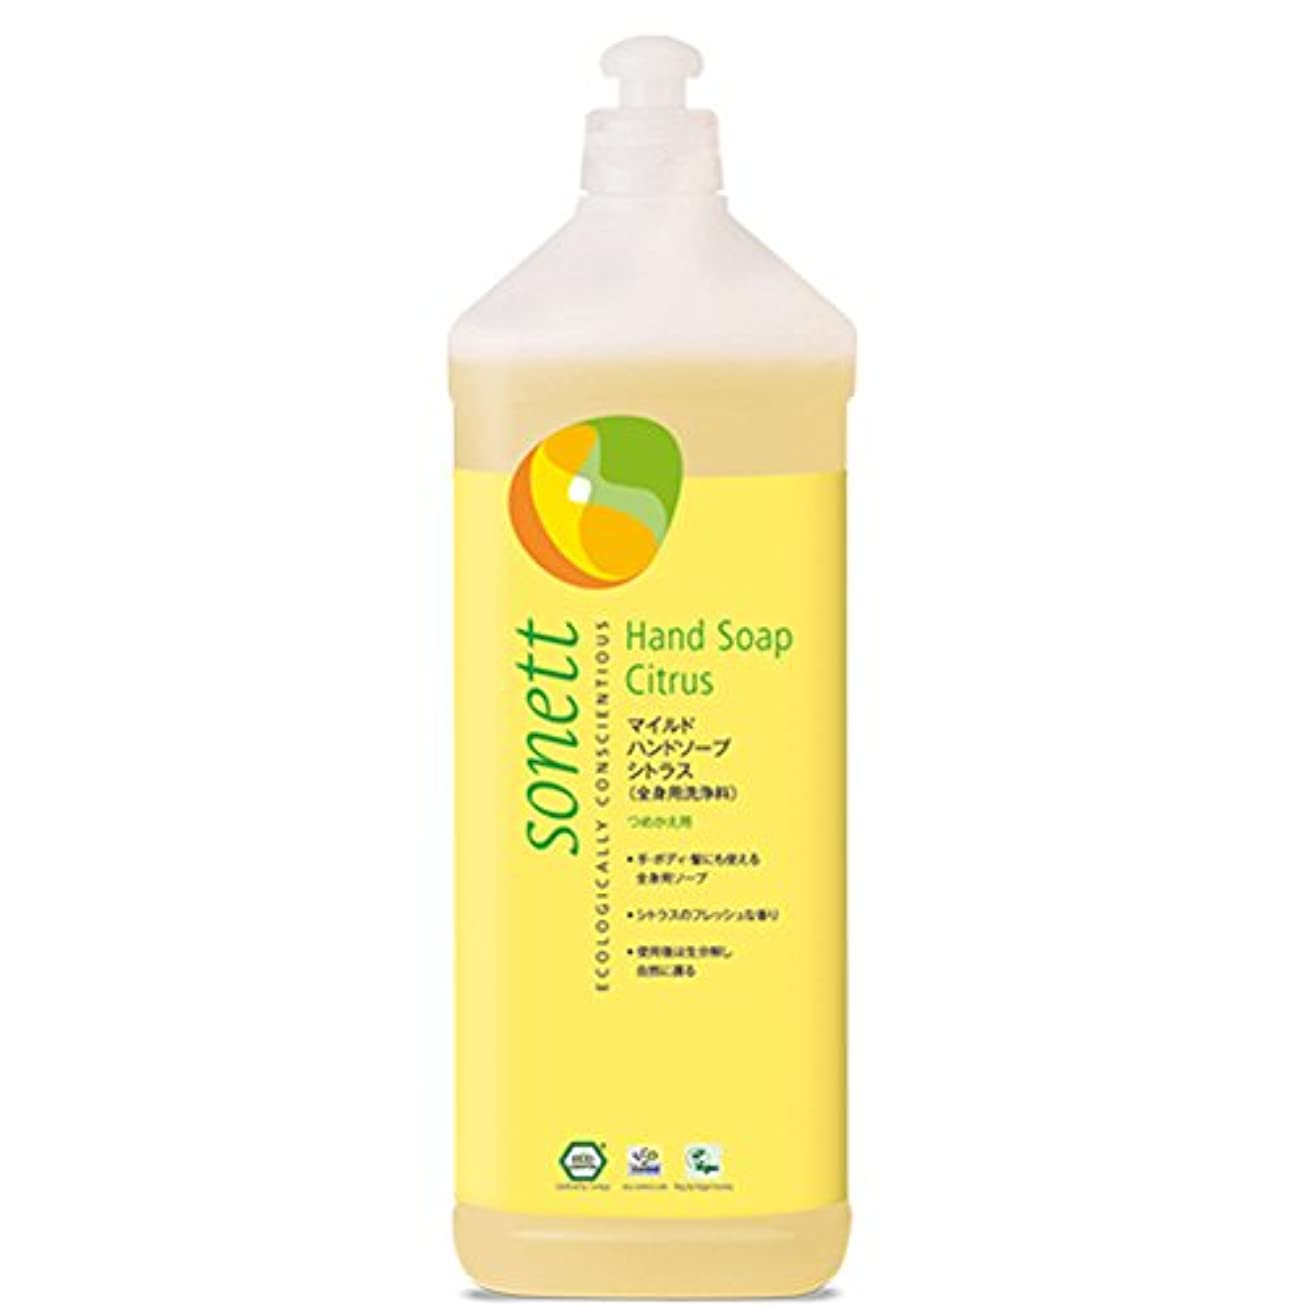 SONETT ( ソネット 洗剤 ) マイルドハンドソープ シトラス 1L  ( ボディー&ハンドソープ 全身 )